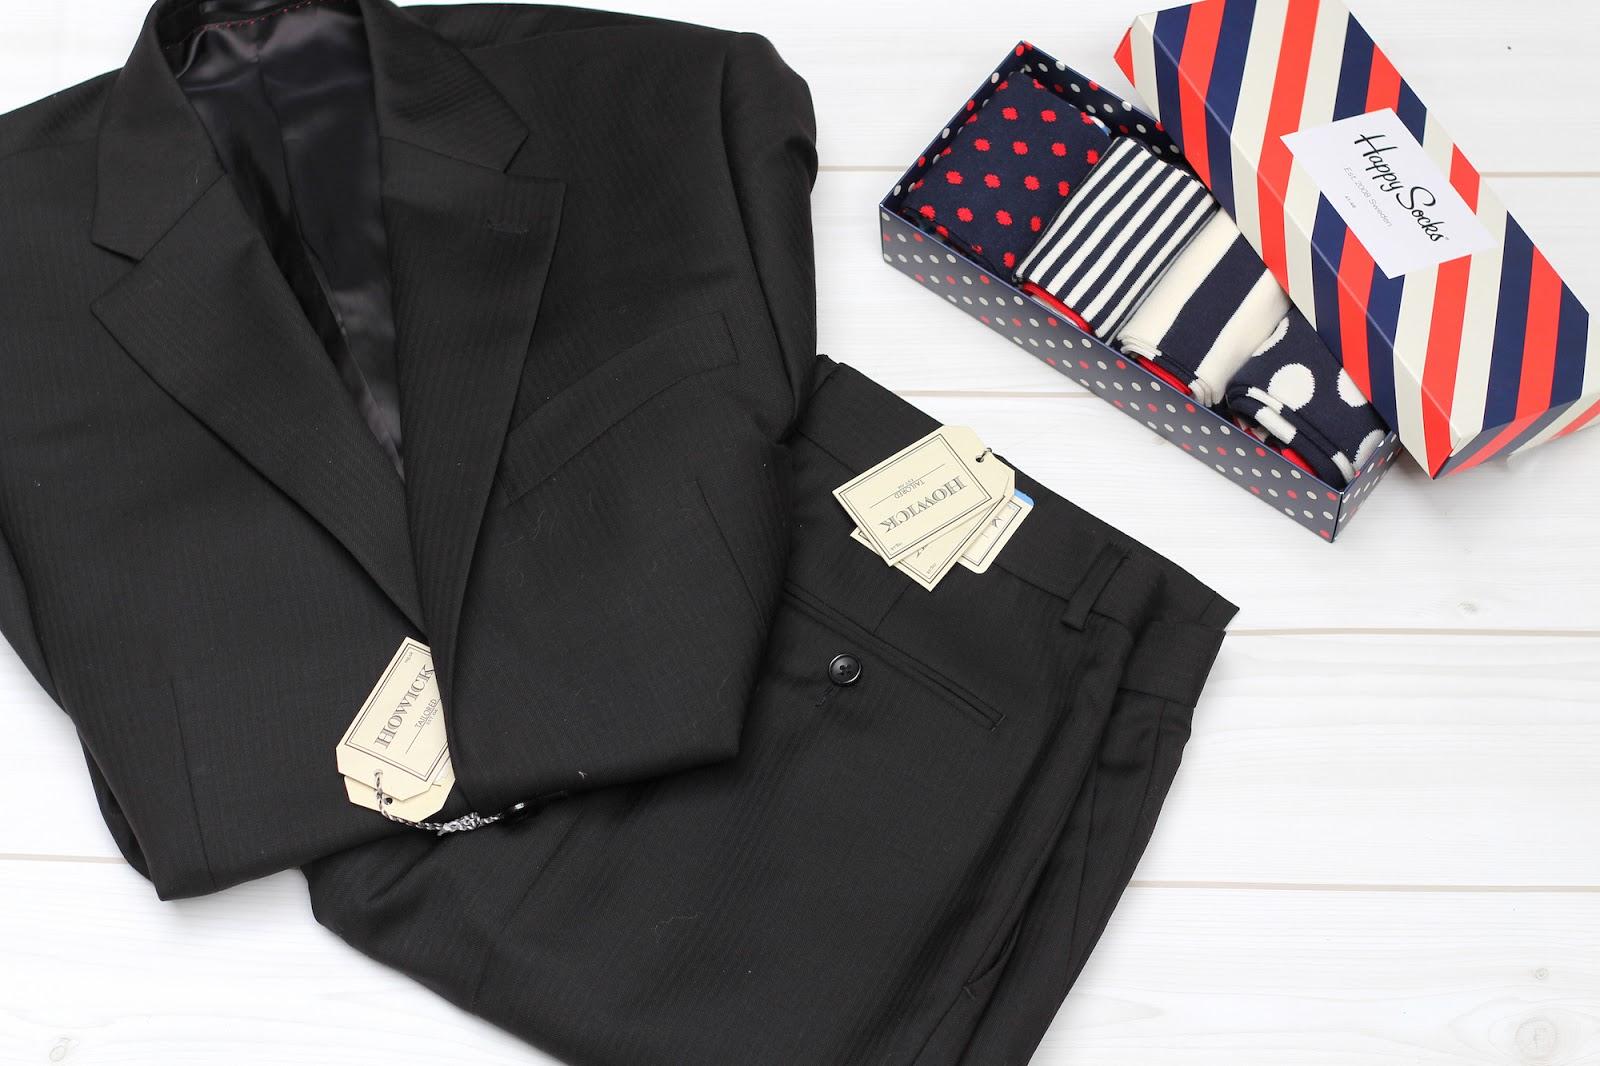 last minute christmas gift guide for him, herringbone suit and happy socks